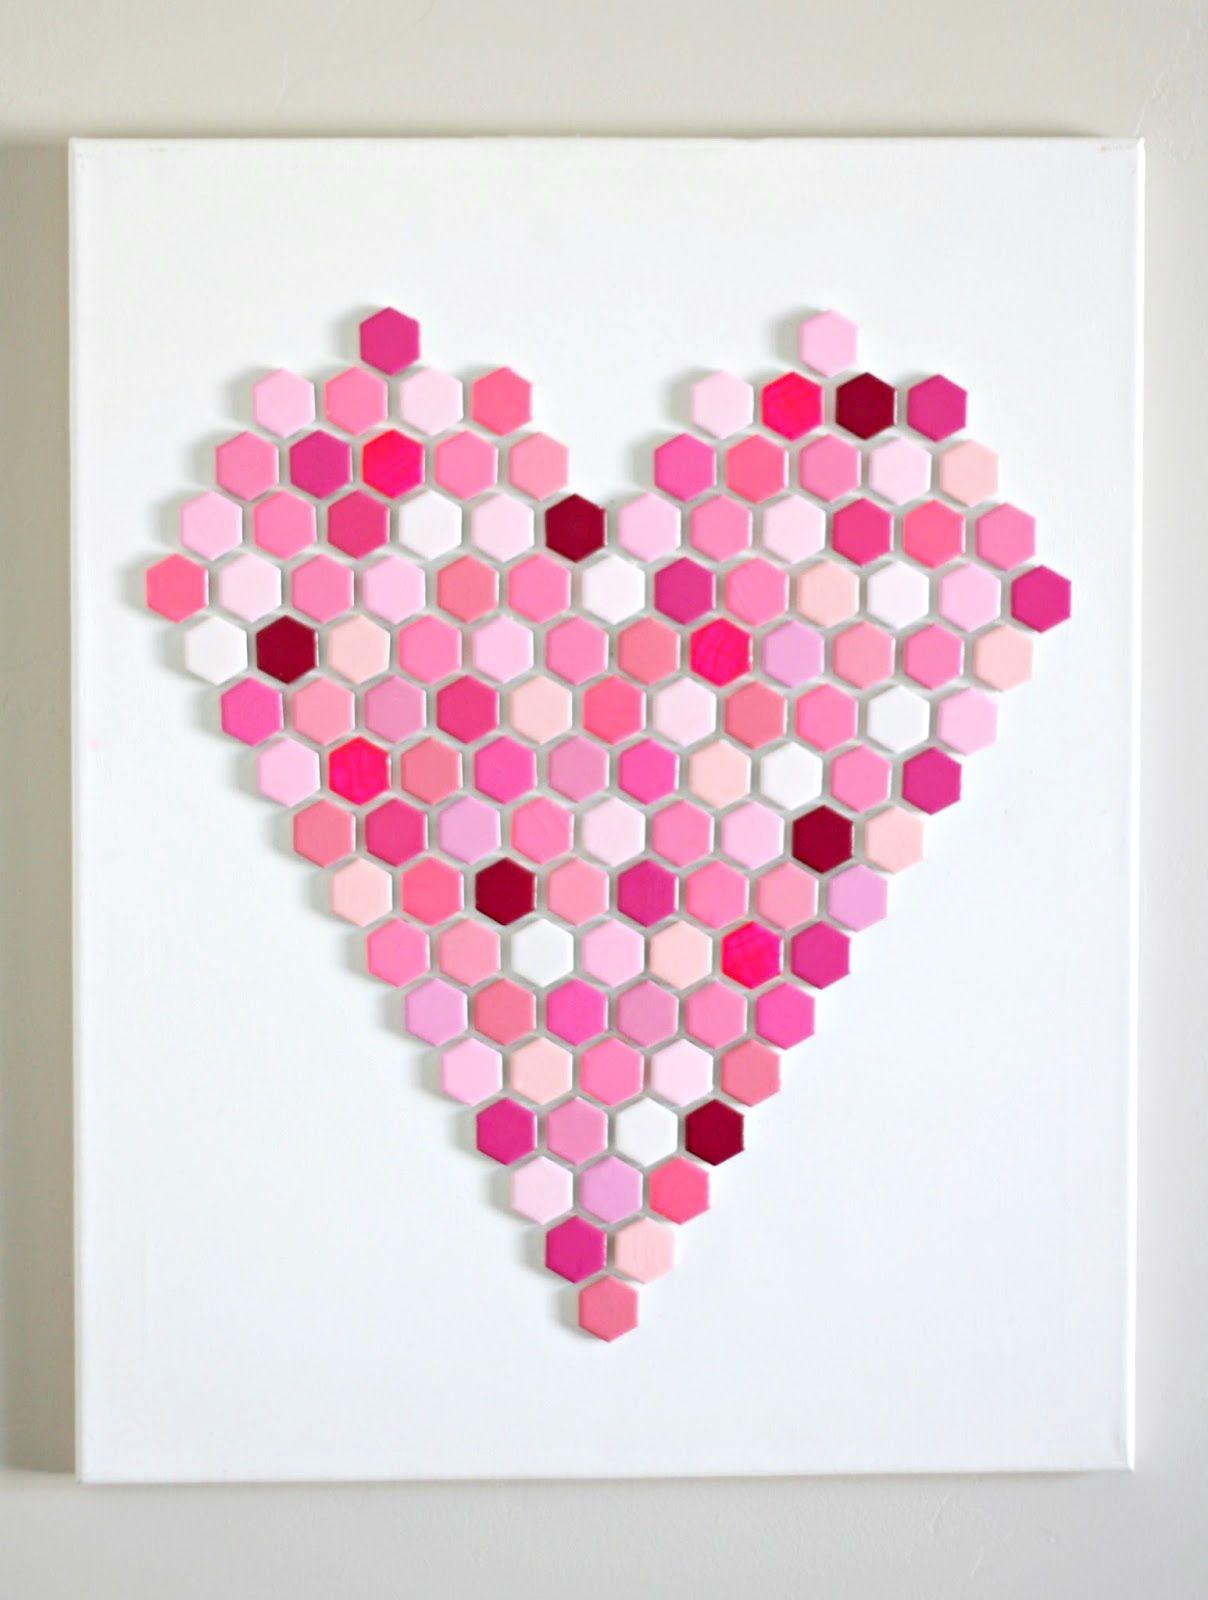 Heart Wall Art Made With Hexagon Tiles Hexagon Tiles Heart Wall Art Diy Tile